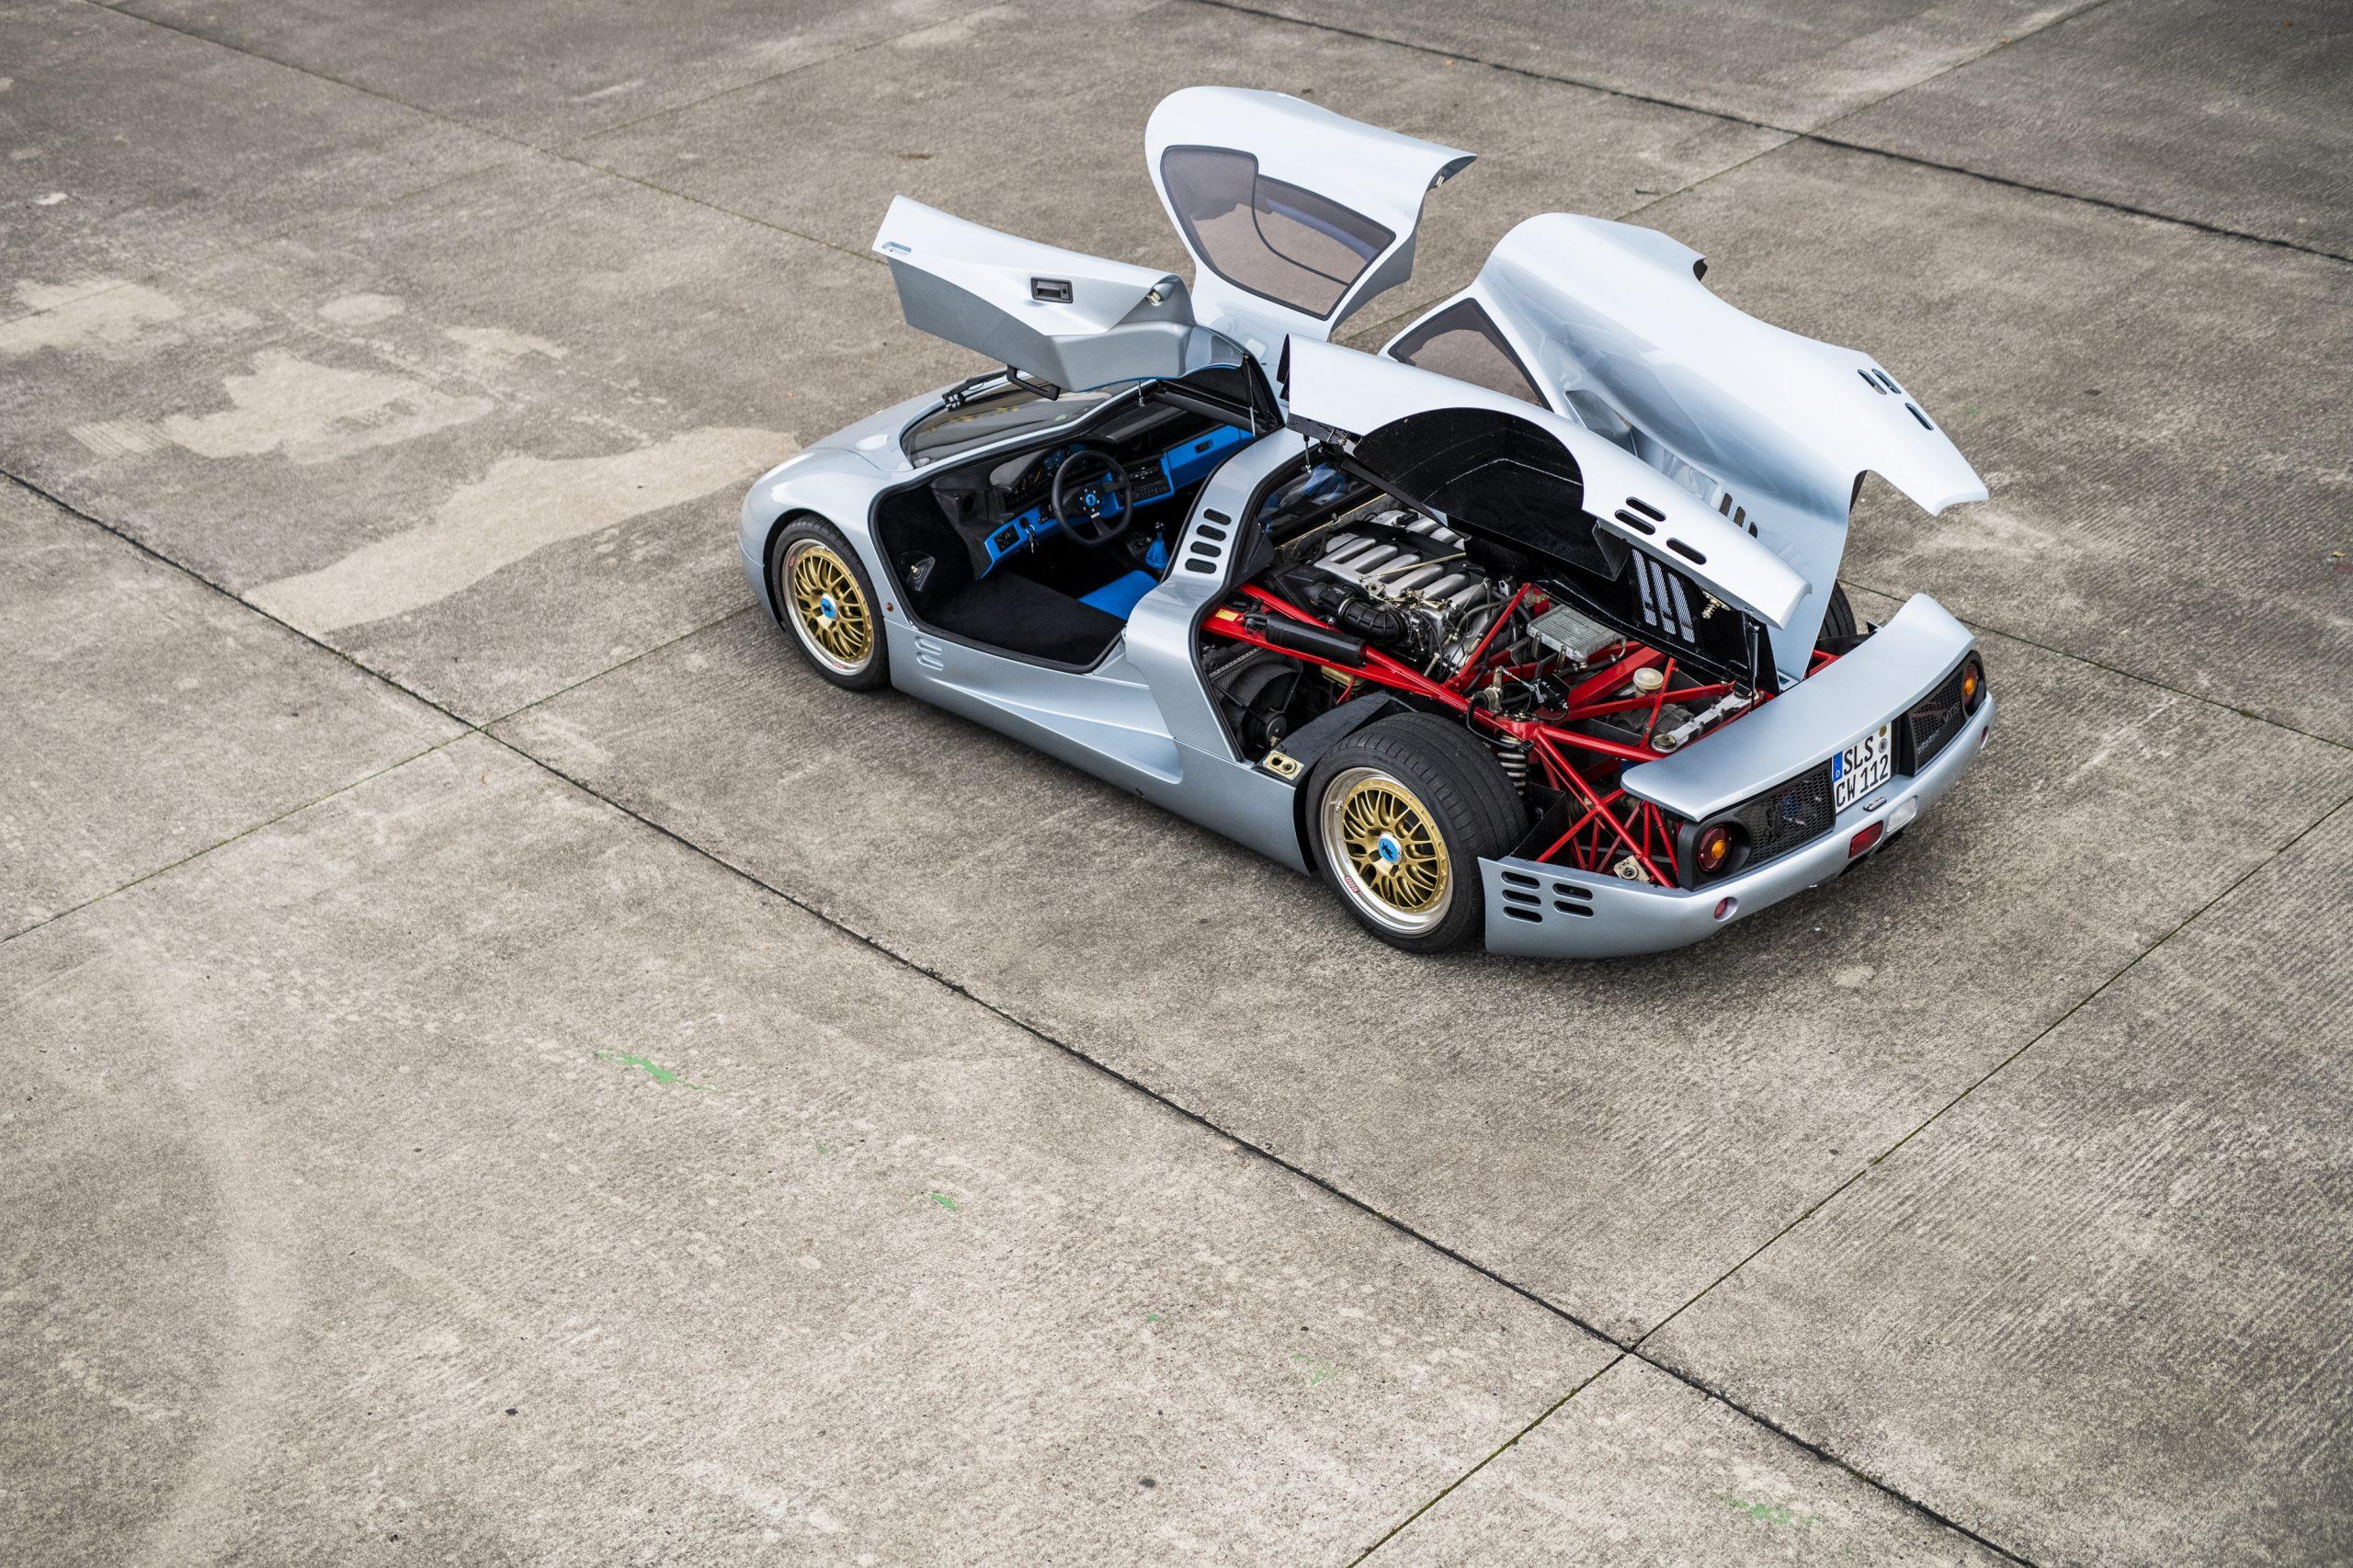 1993 Isdera Commendatore 112i rear three-quarter doors up panels open